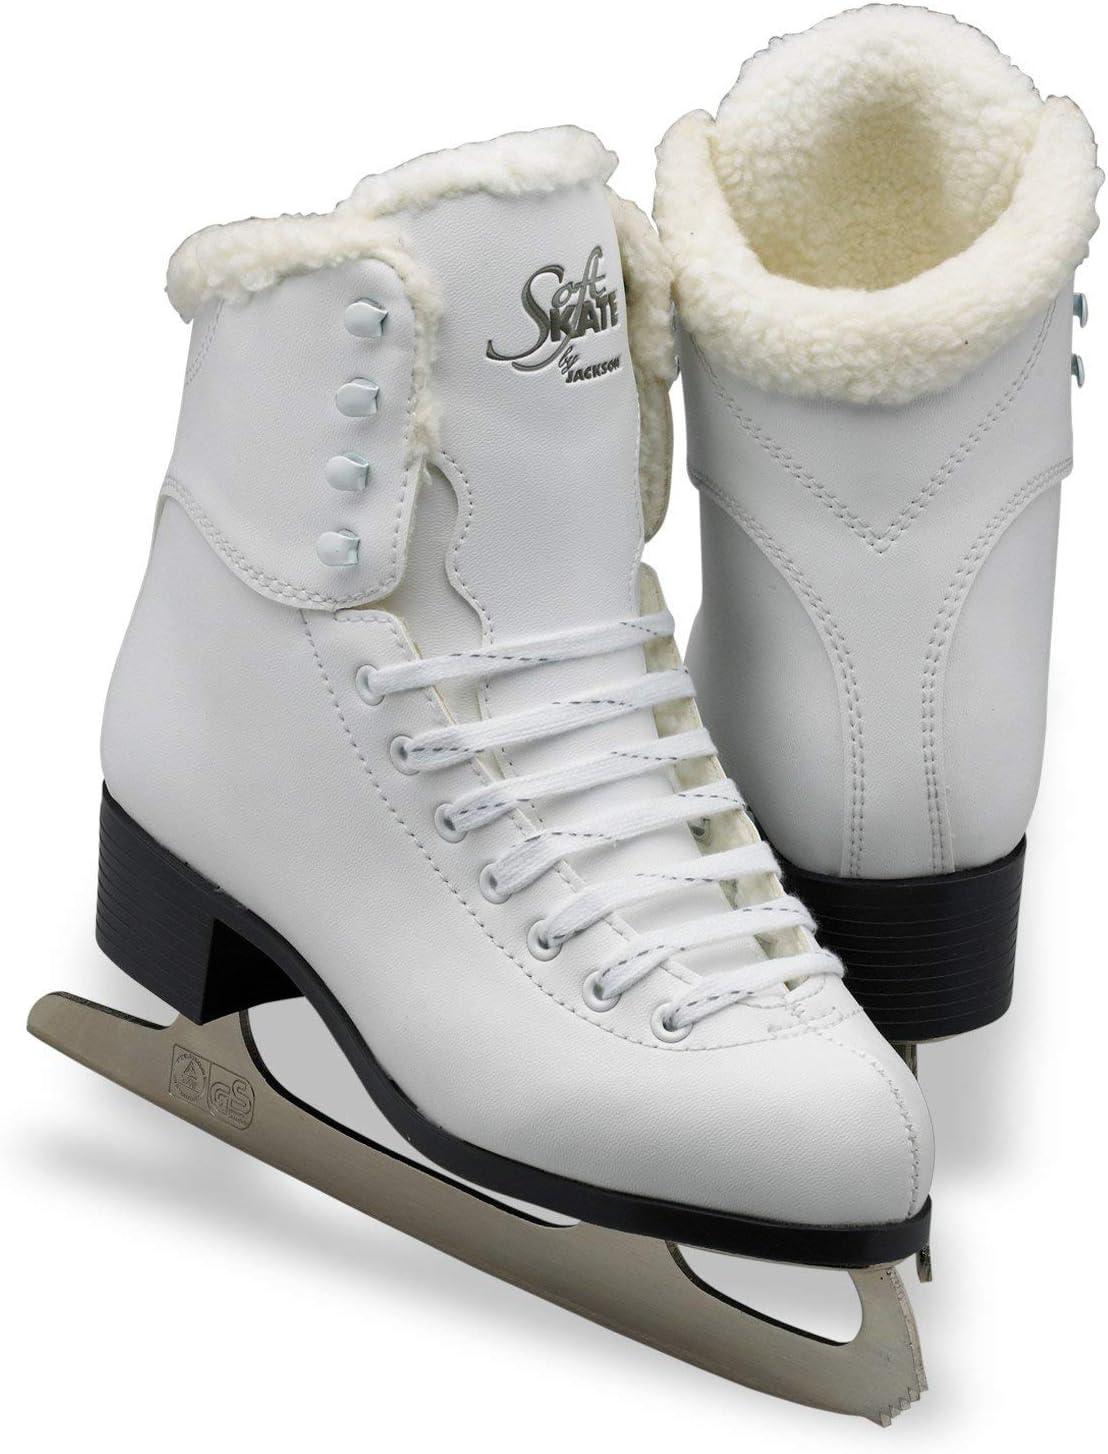 Jackson Ultima GS180 SoftSkate Womens Ice Skates Blue, Fleece, Pink, Purple